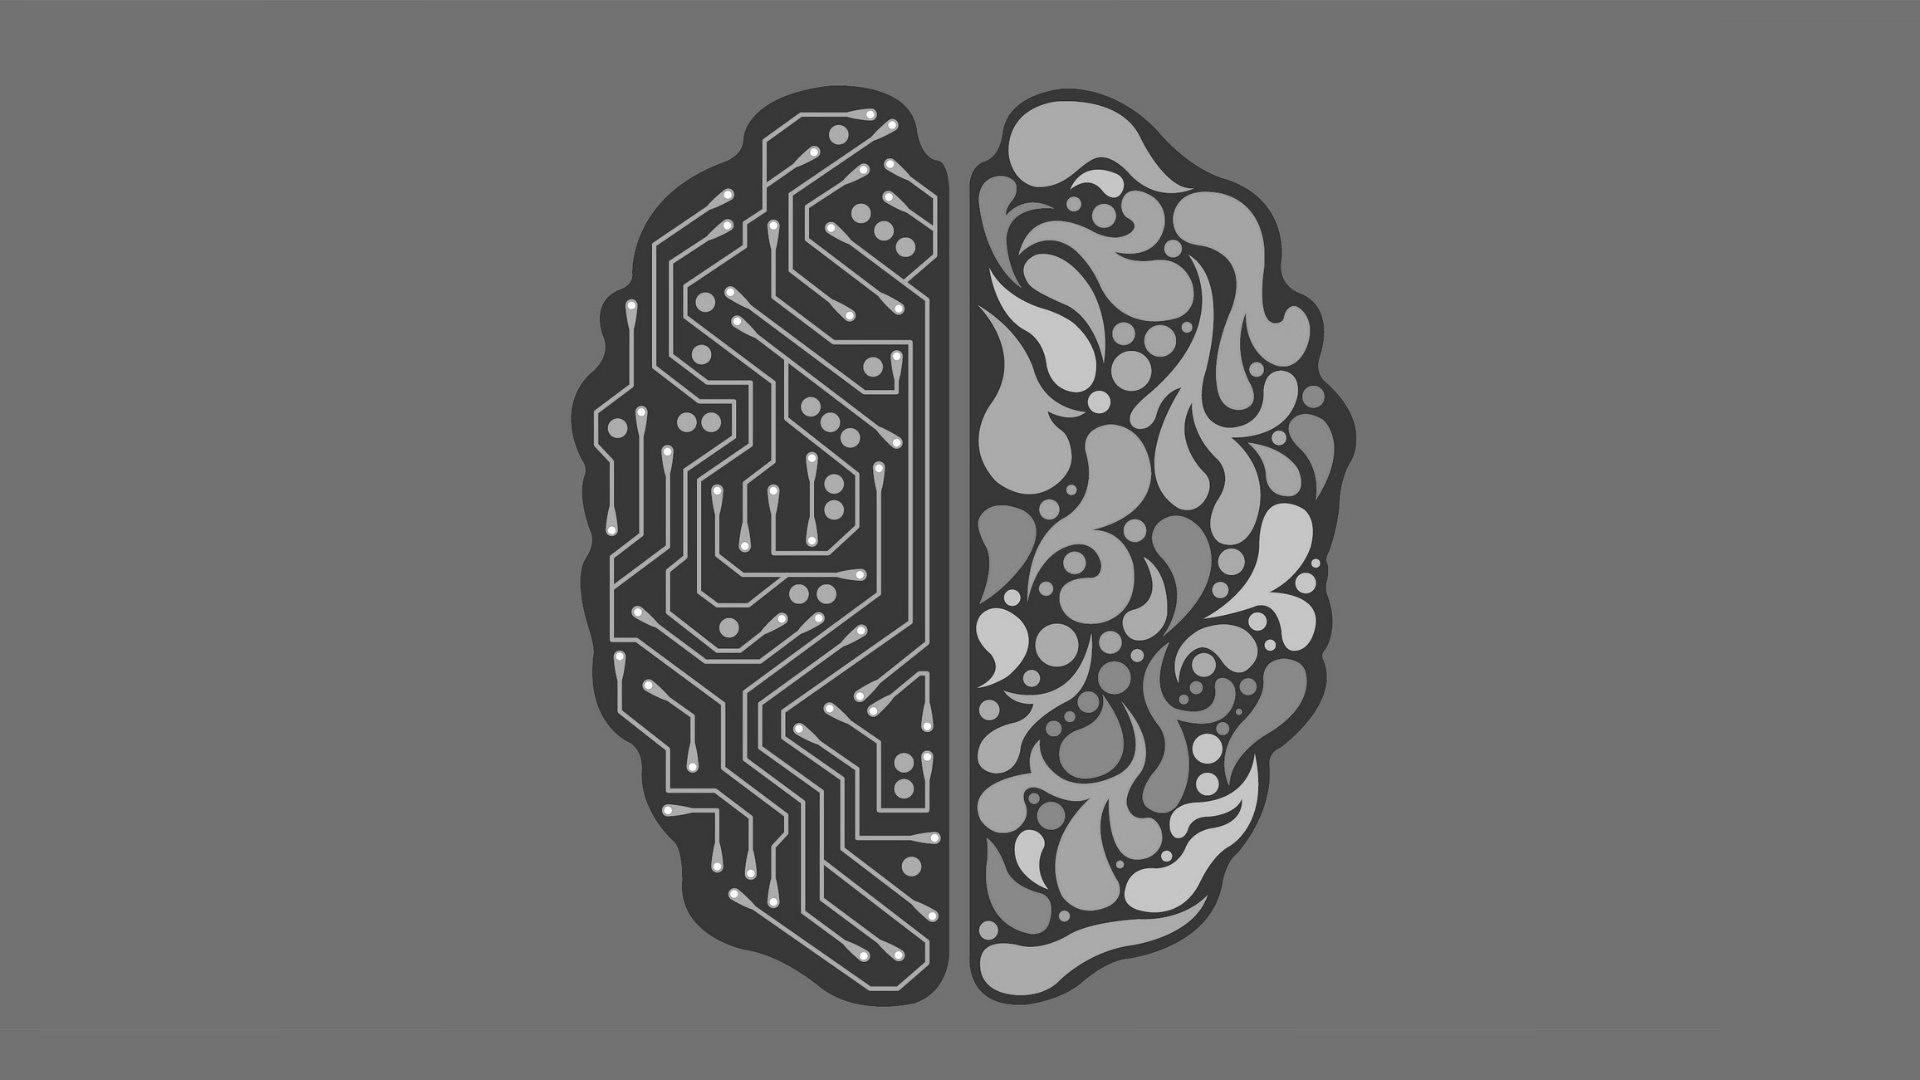 decentralizalt mesterseges intelligencia platform